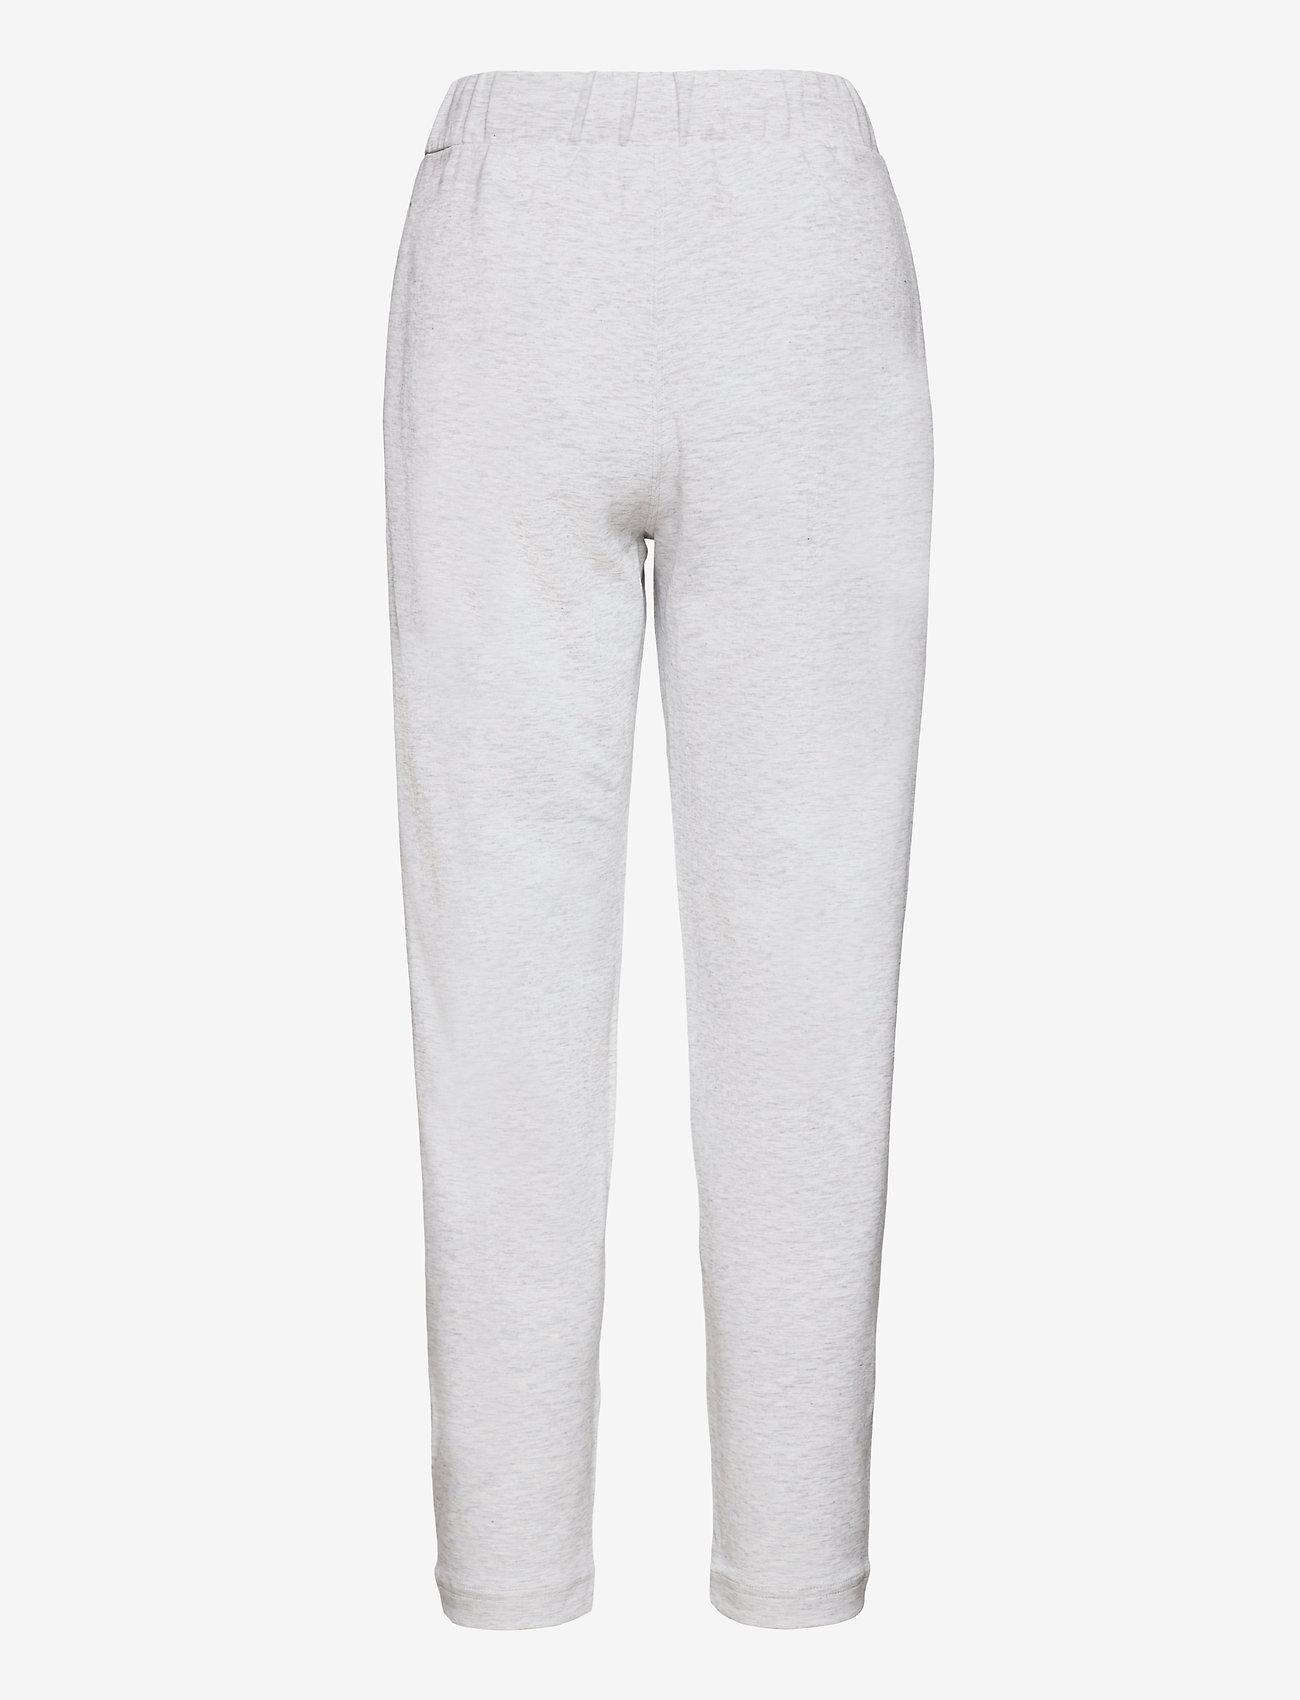 Max Mara Leisure - PESCA - clothing - light grey - 1